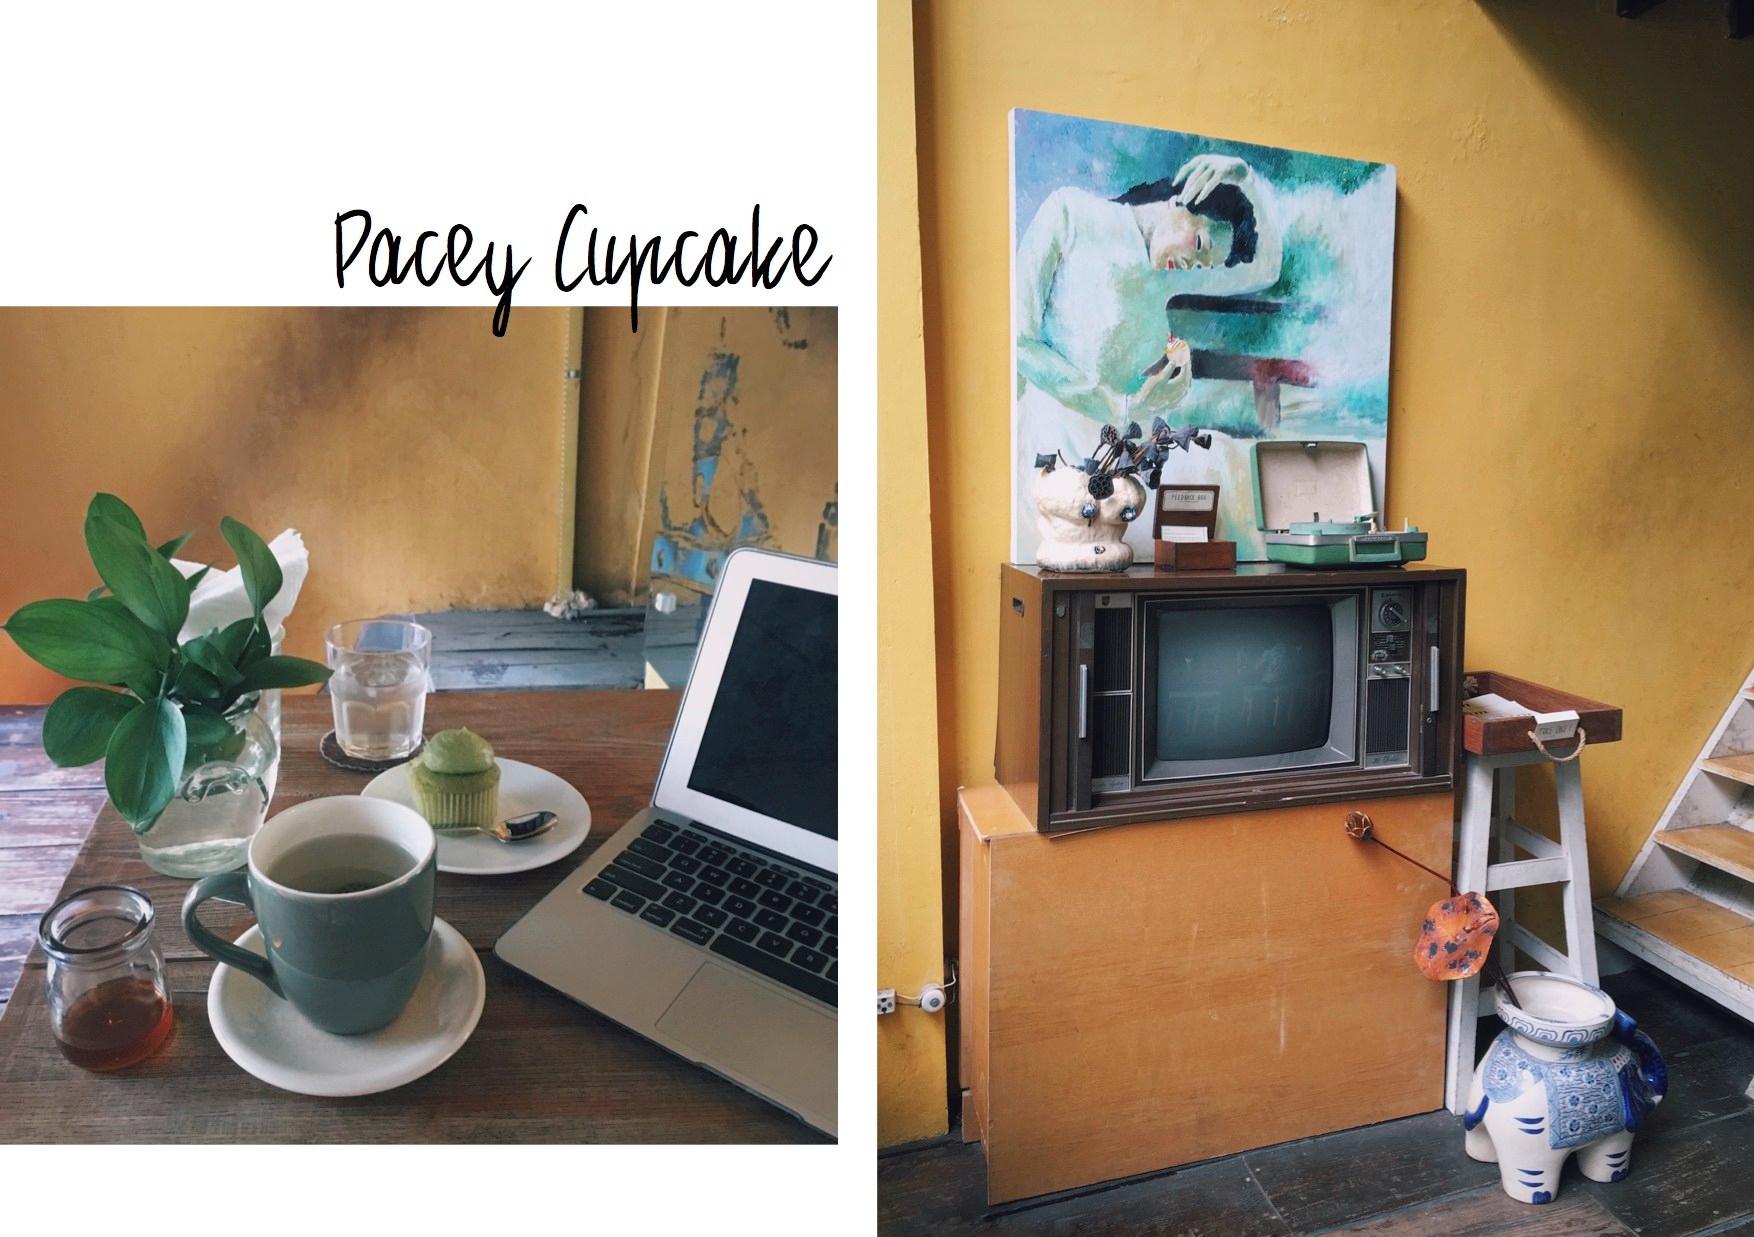 Pacey cupcake